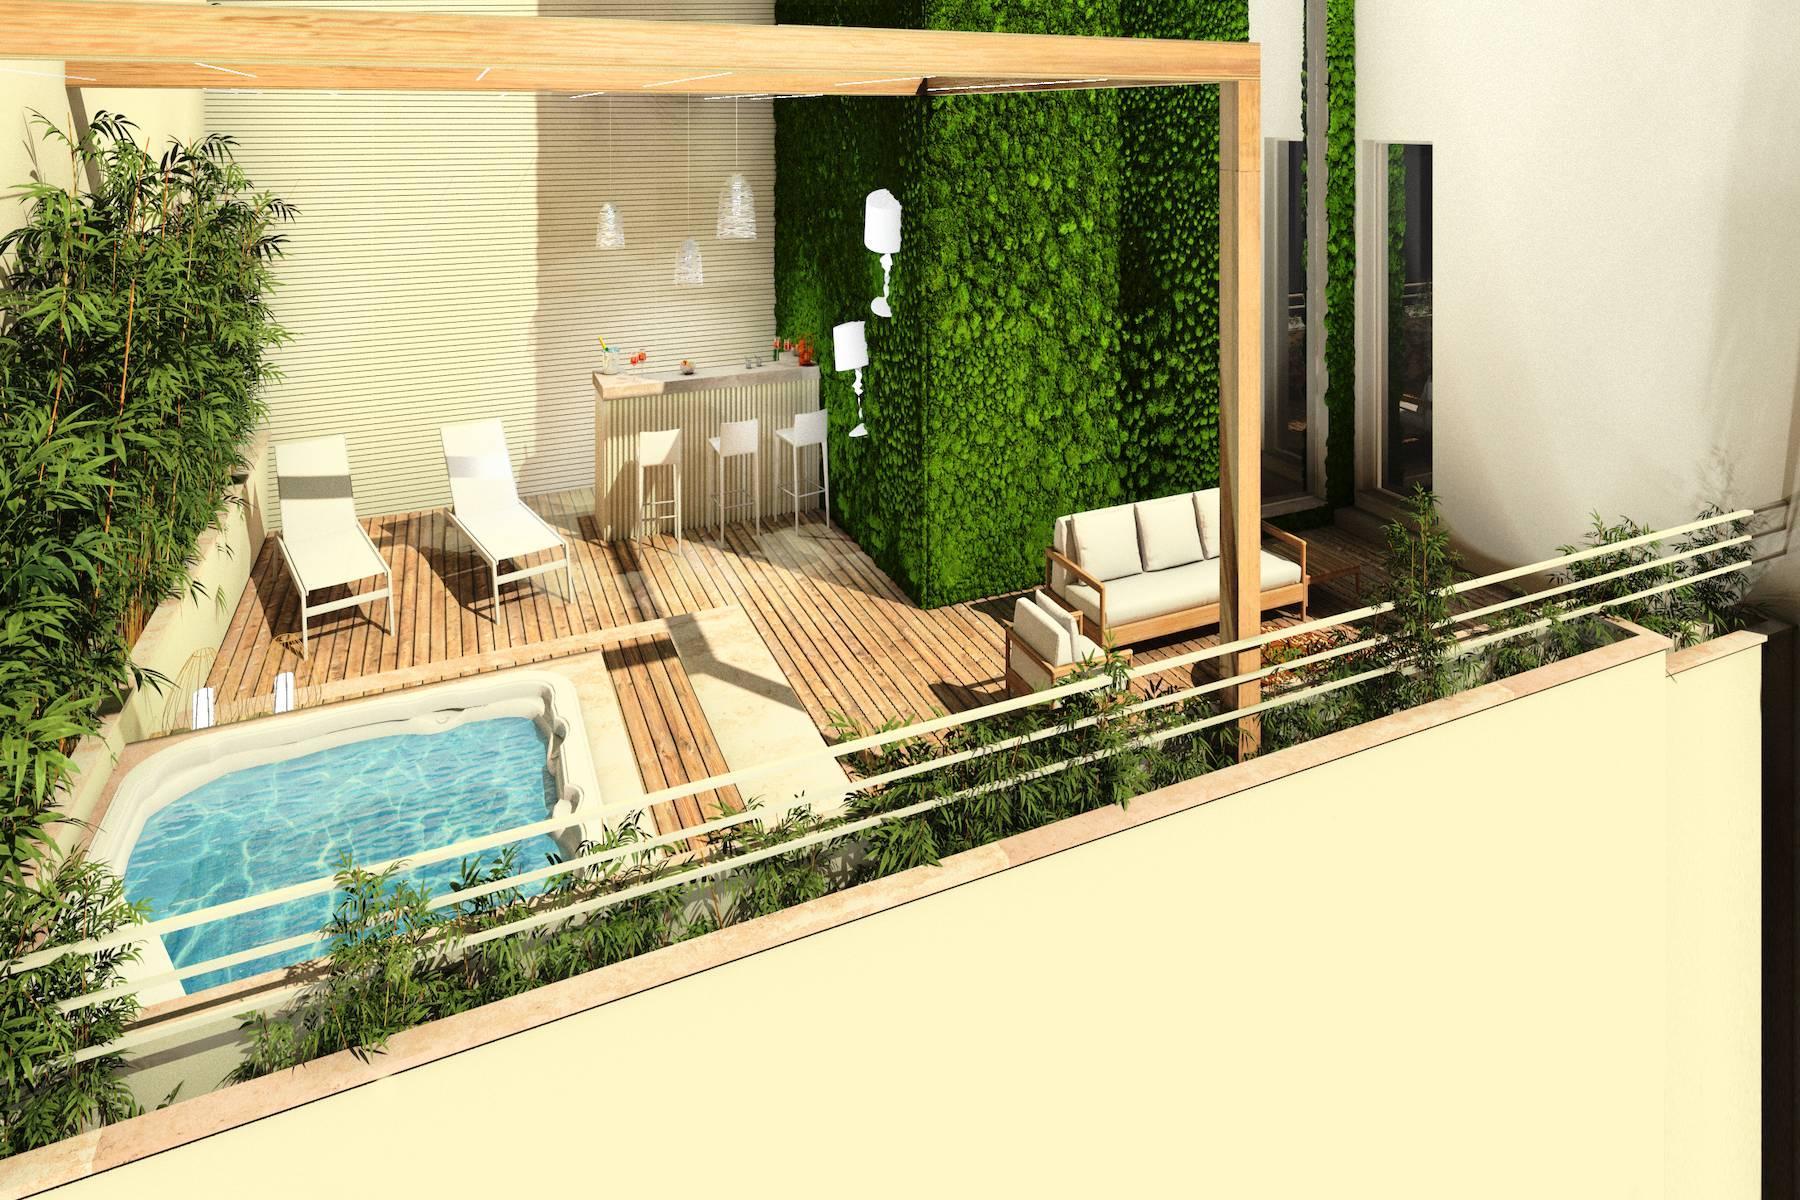 Luxus-Wohnungen am Meer in Viareggio - 14